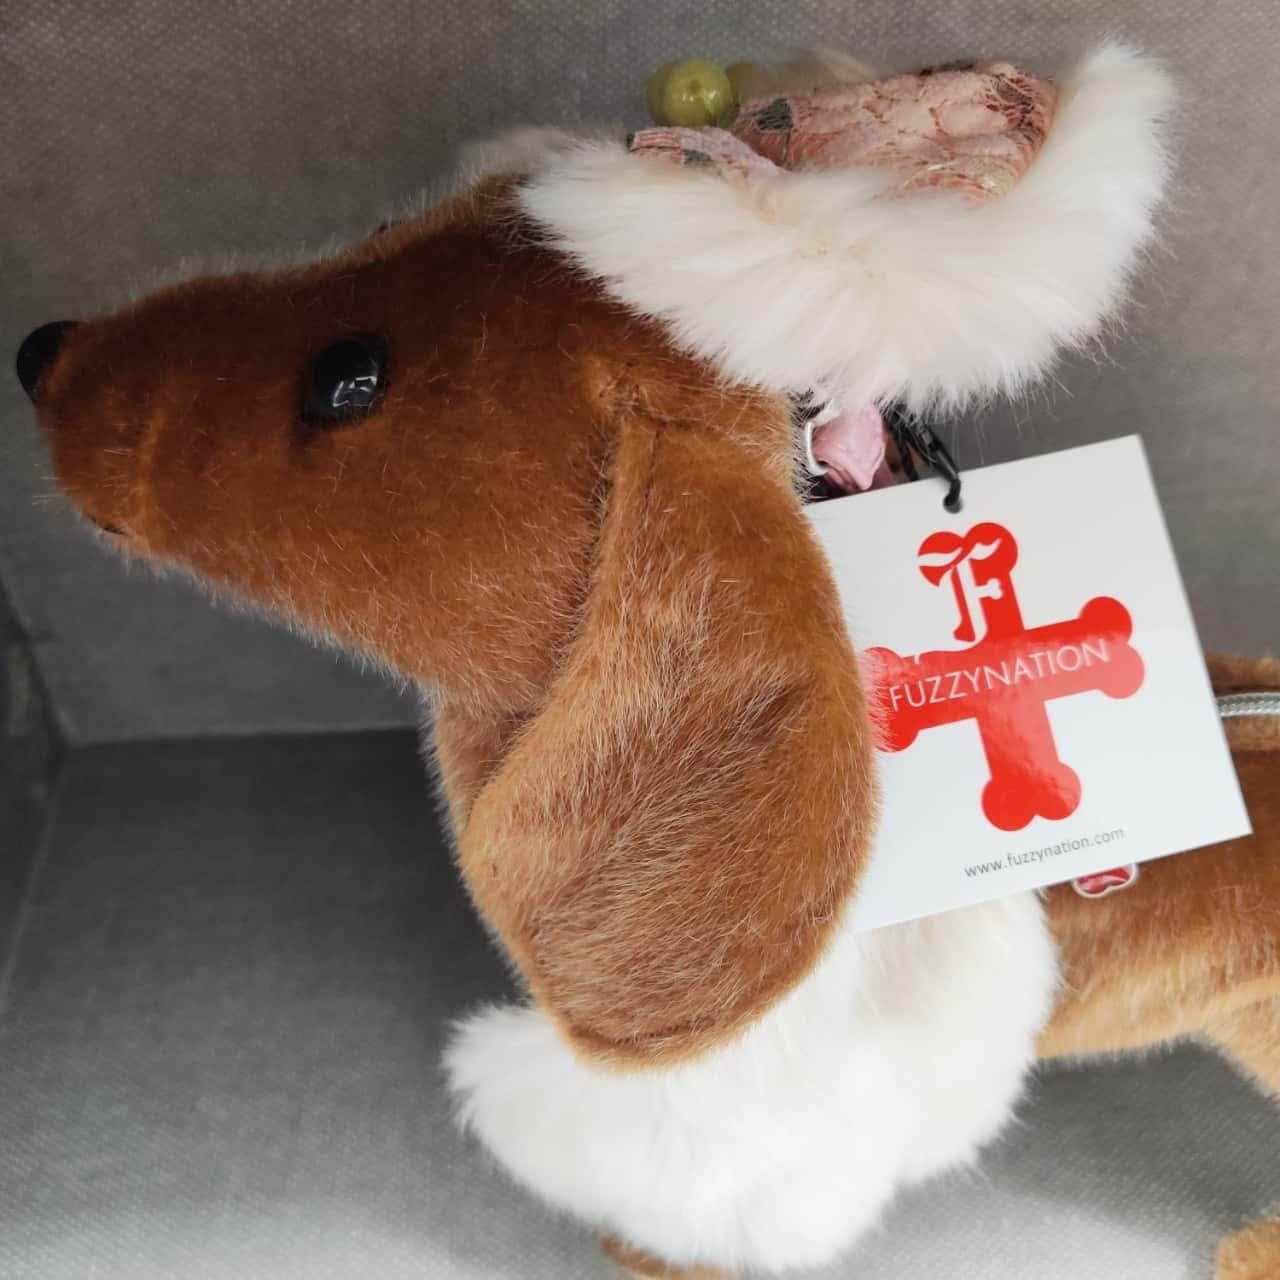 Fuzzy Nation Doggy Purse bag